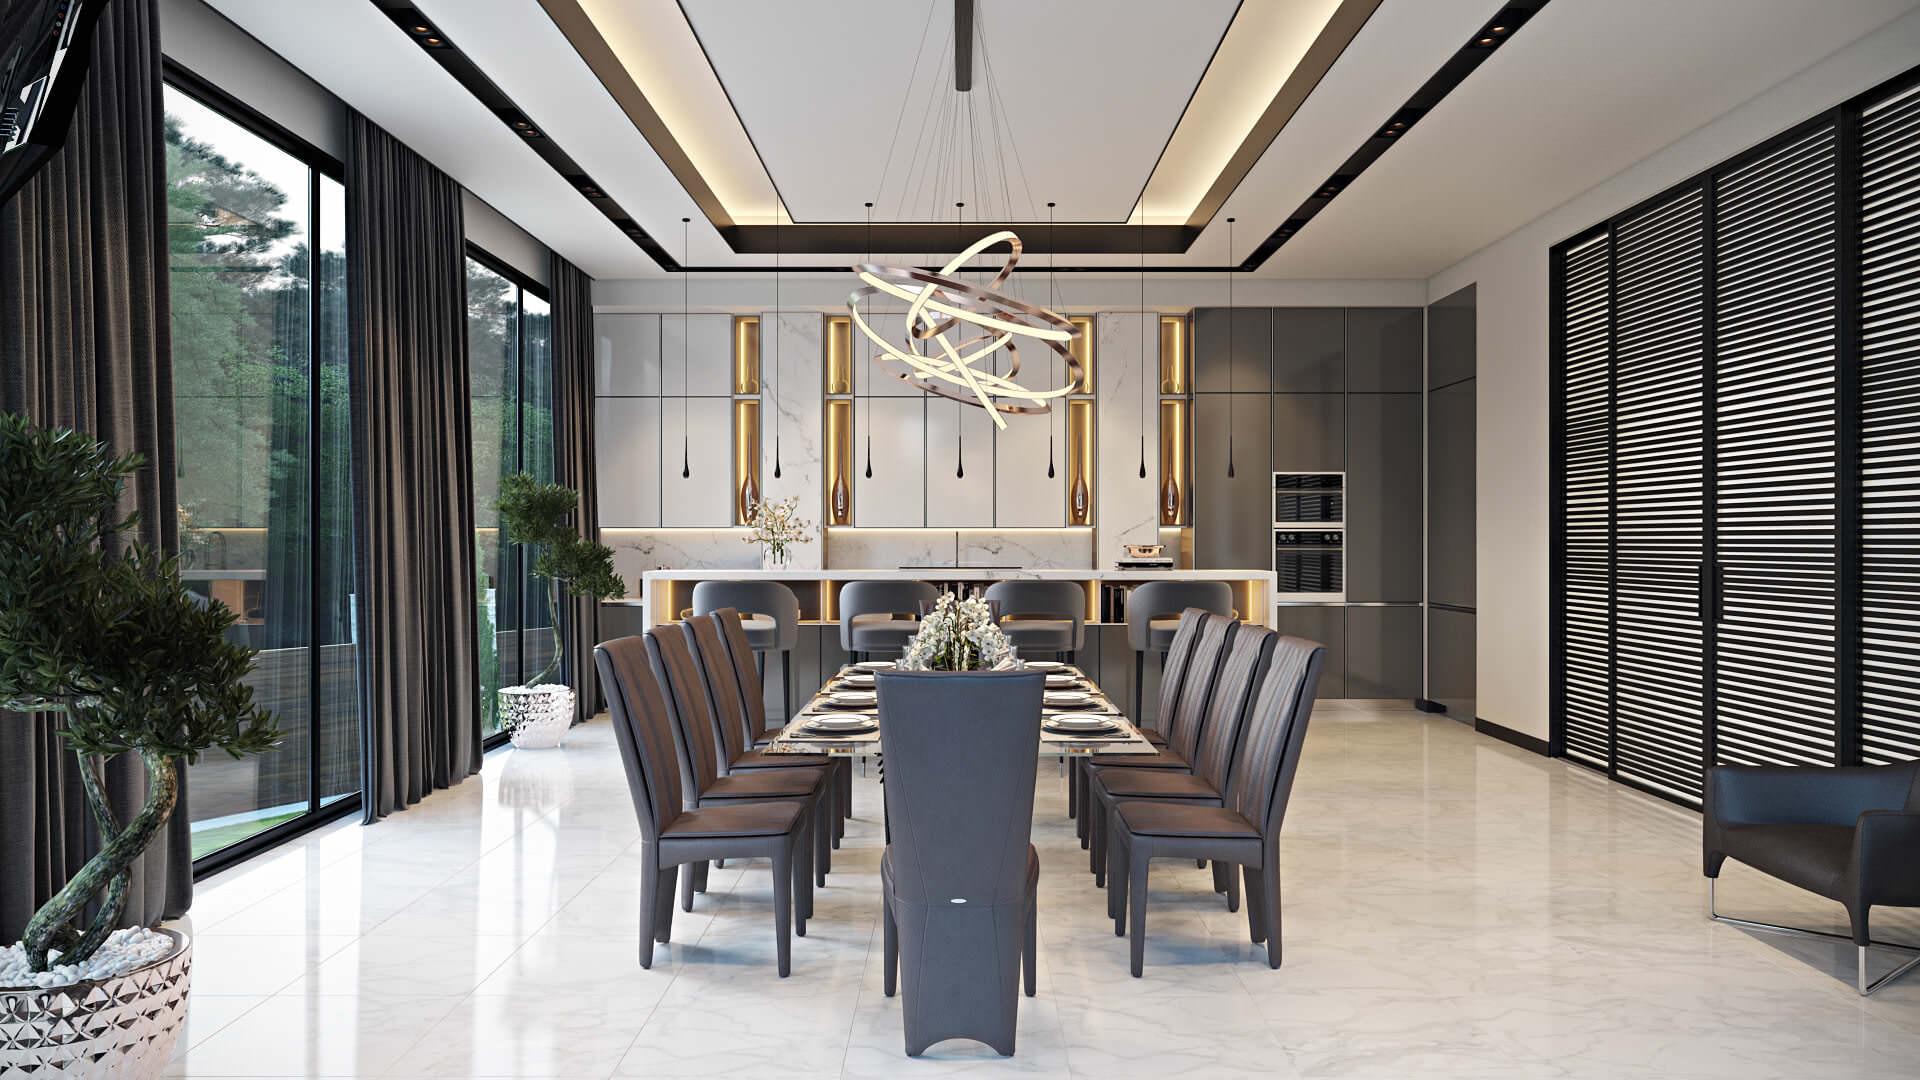 3D Visualization of a Modern Interior Design